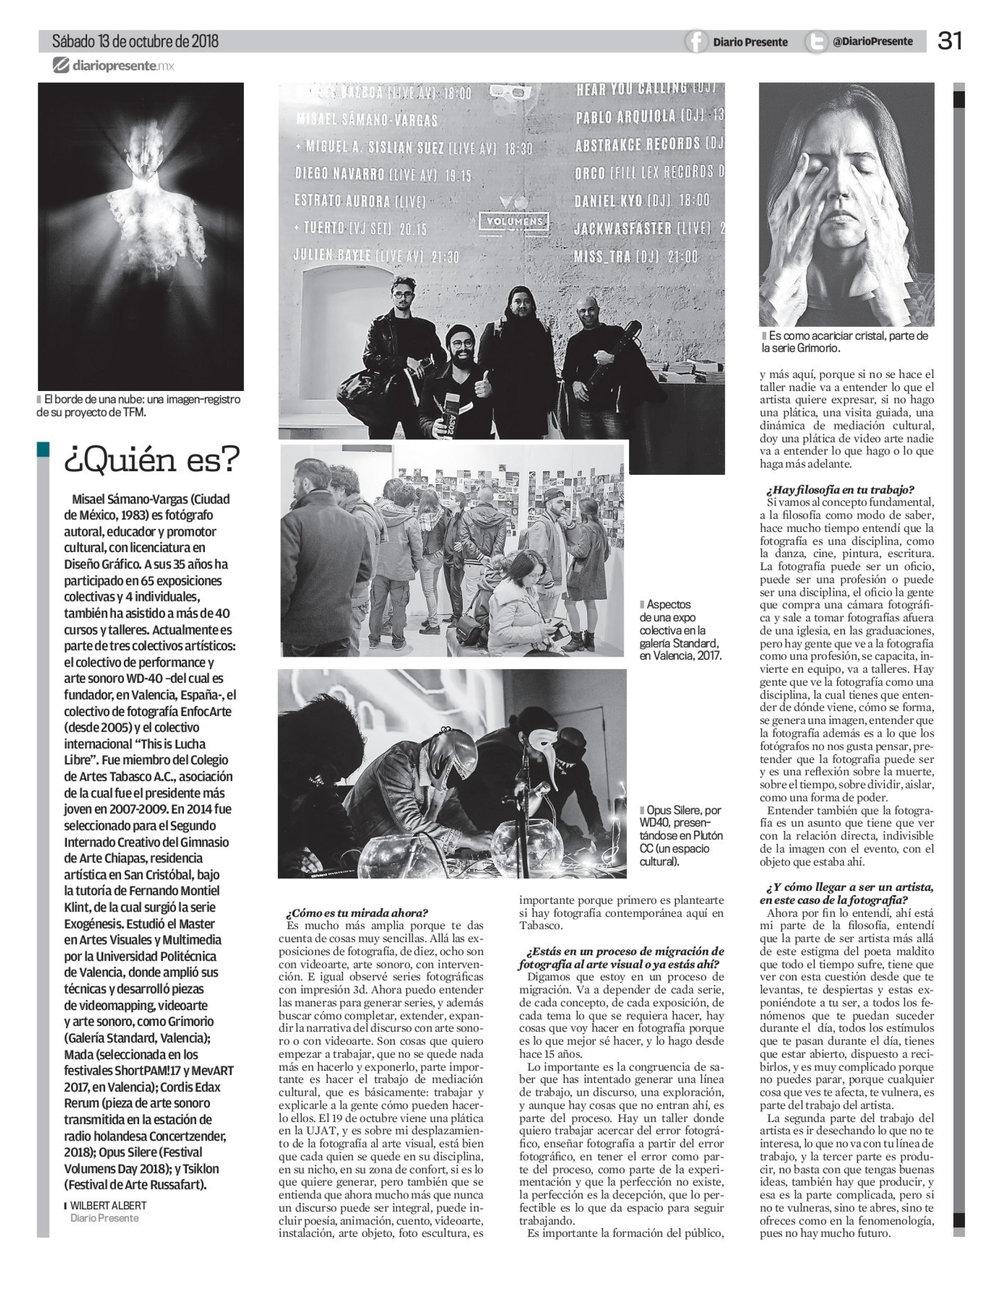 Presente Arte Visual Entrevista-2 ima.jpg